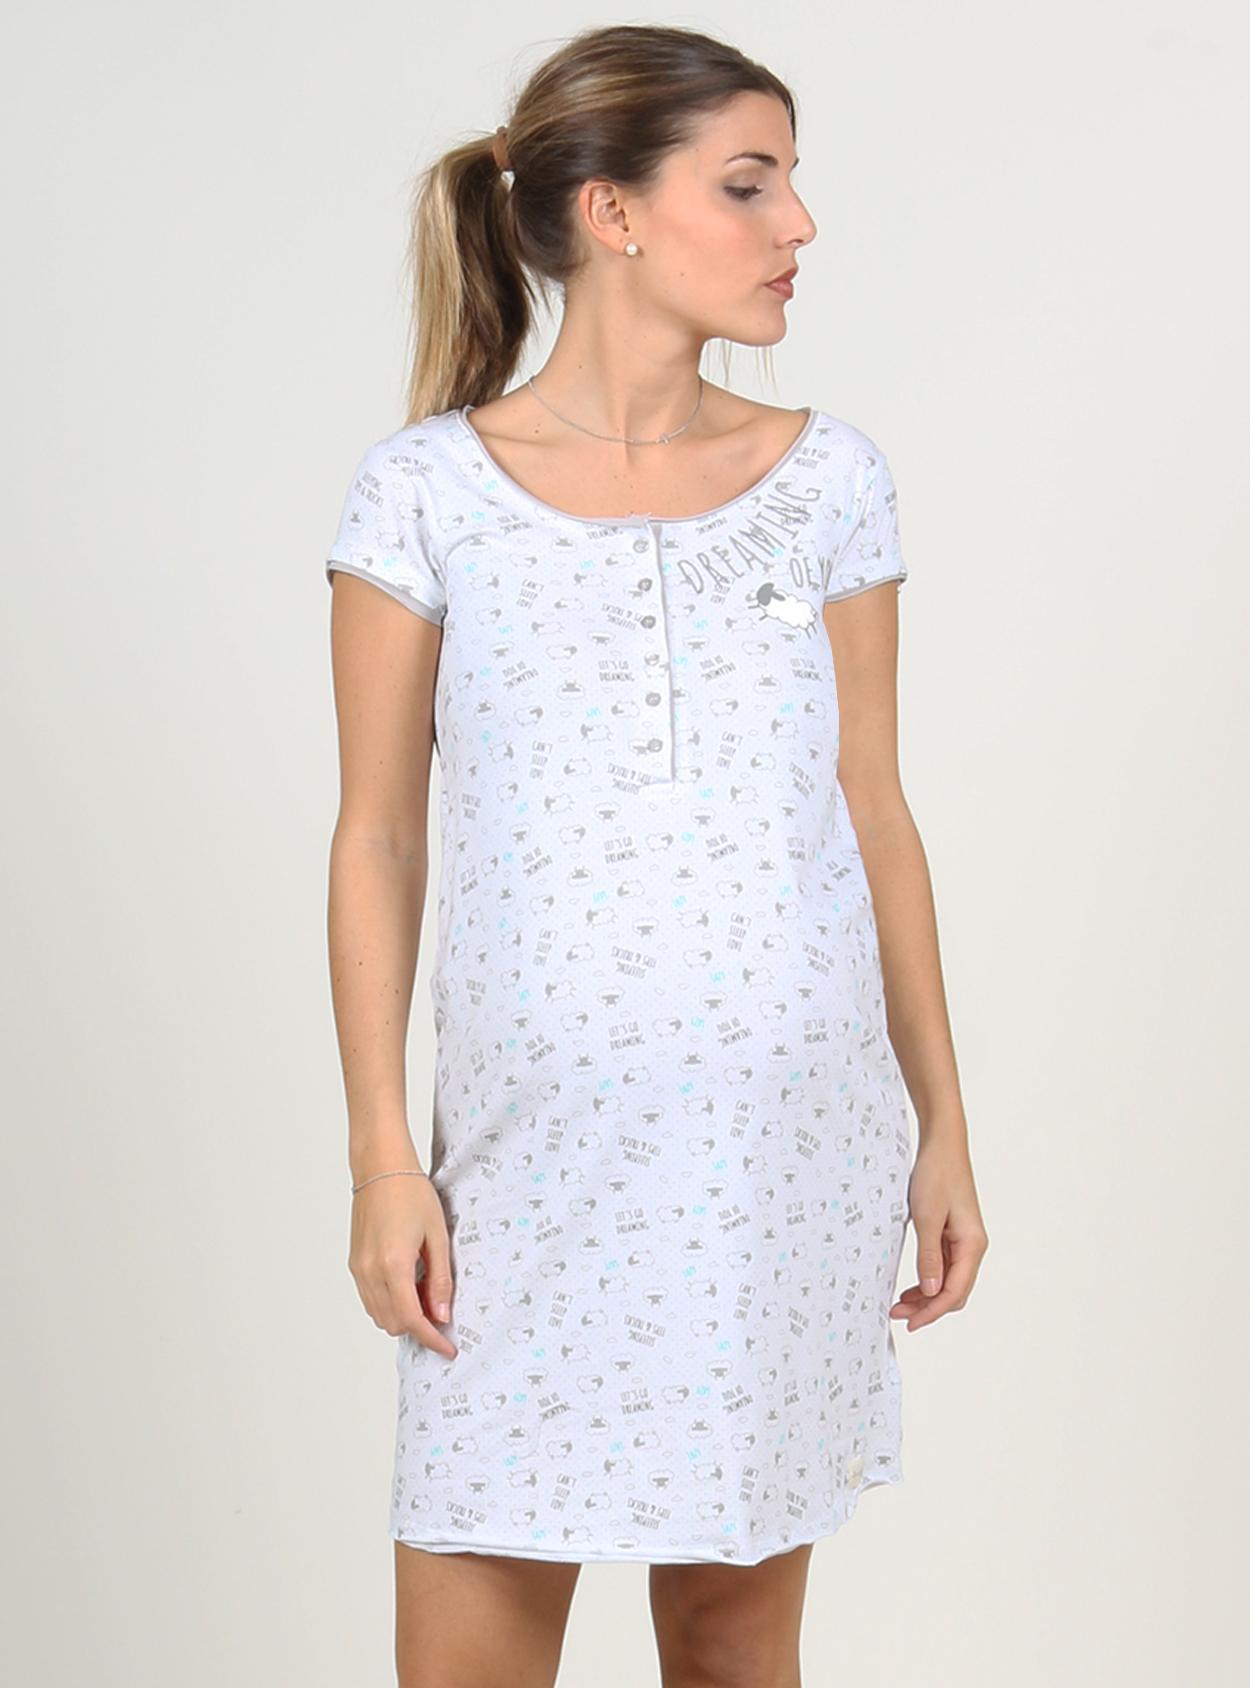 Camisa de dormir estampados manga corta